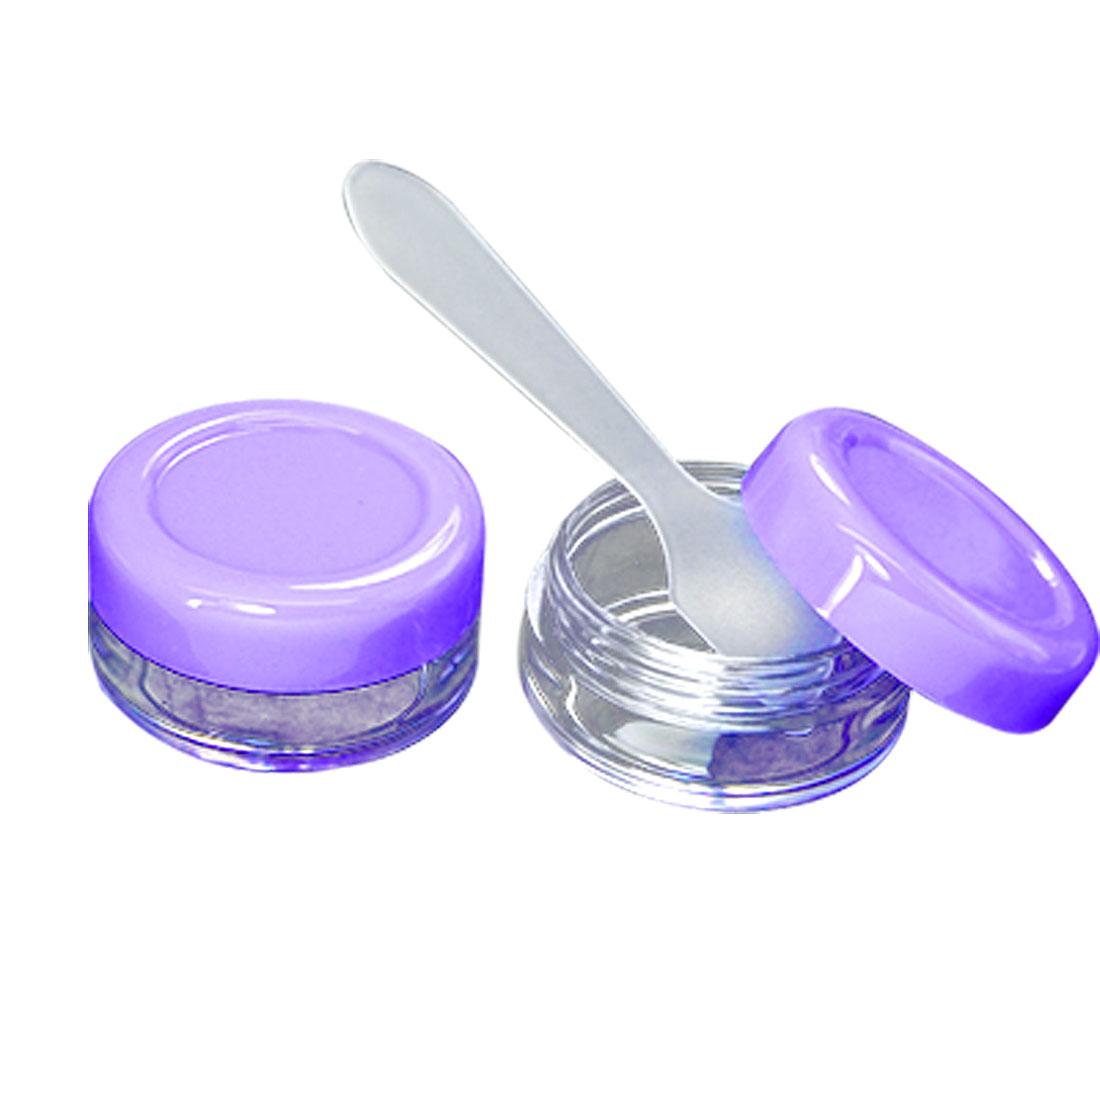 Taveling Plastic 2 PCS Purple Cosmetic Cream Box + Spoon